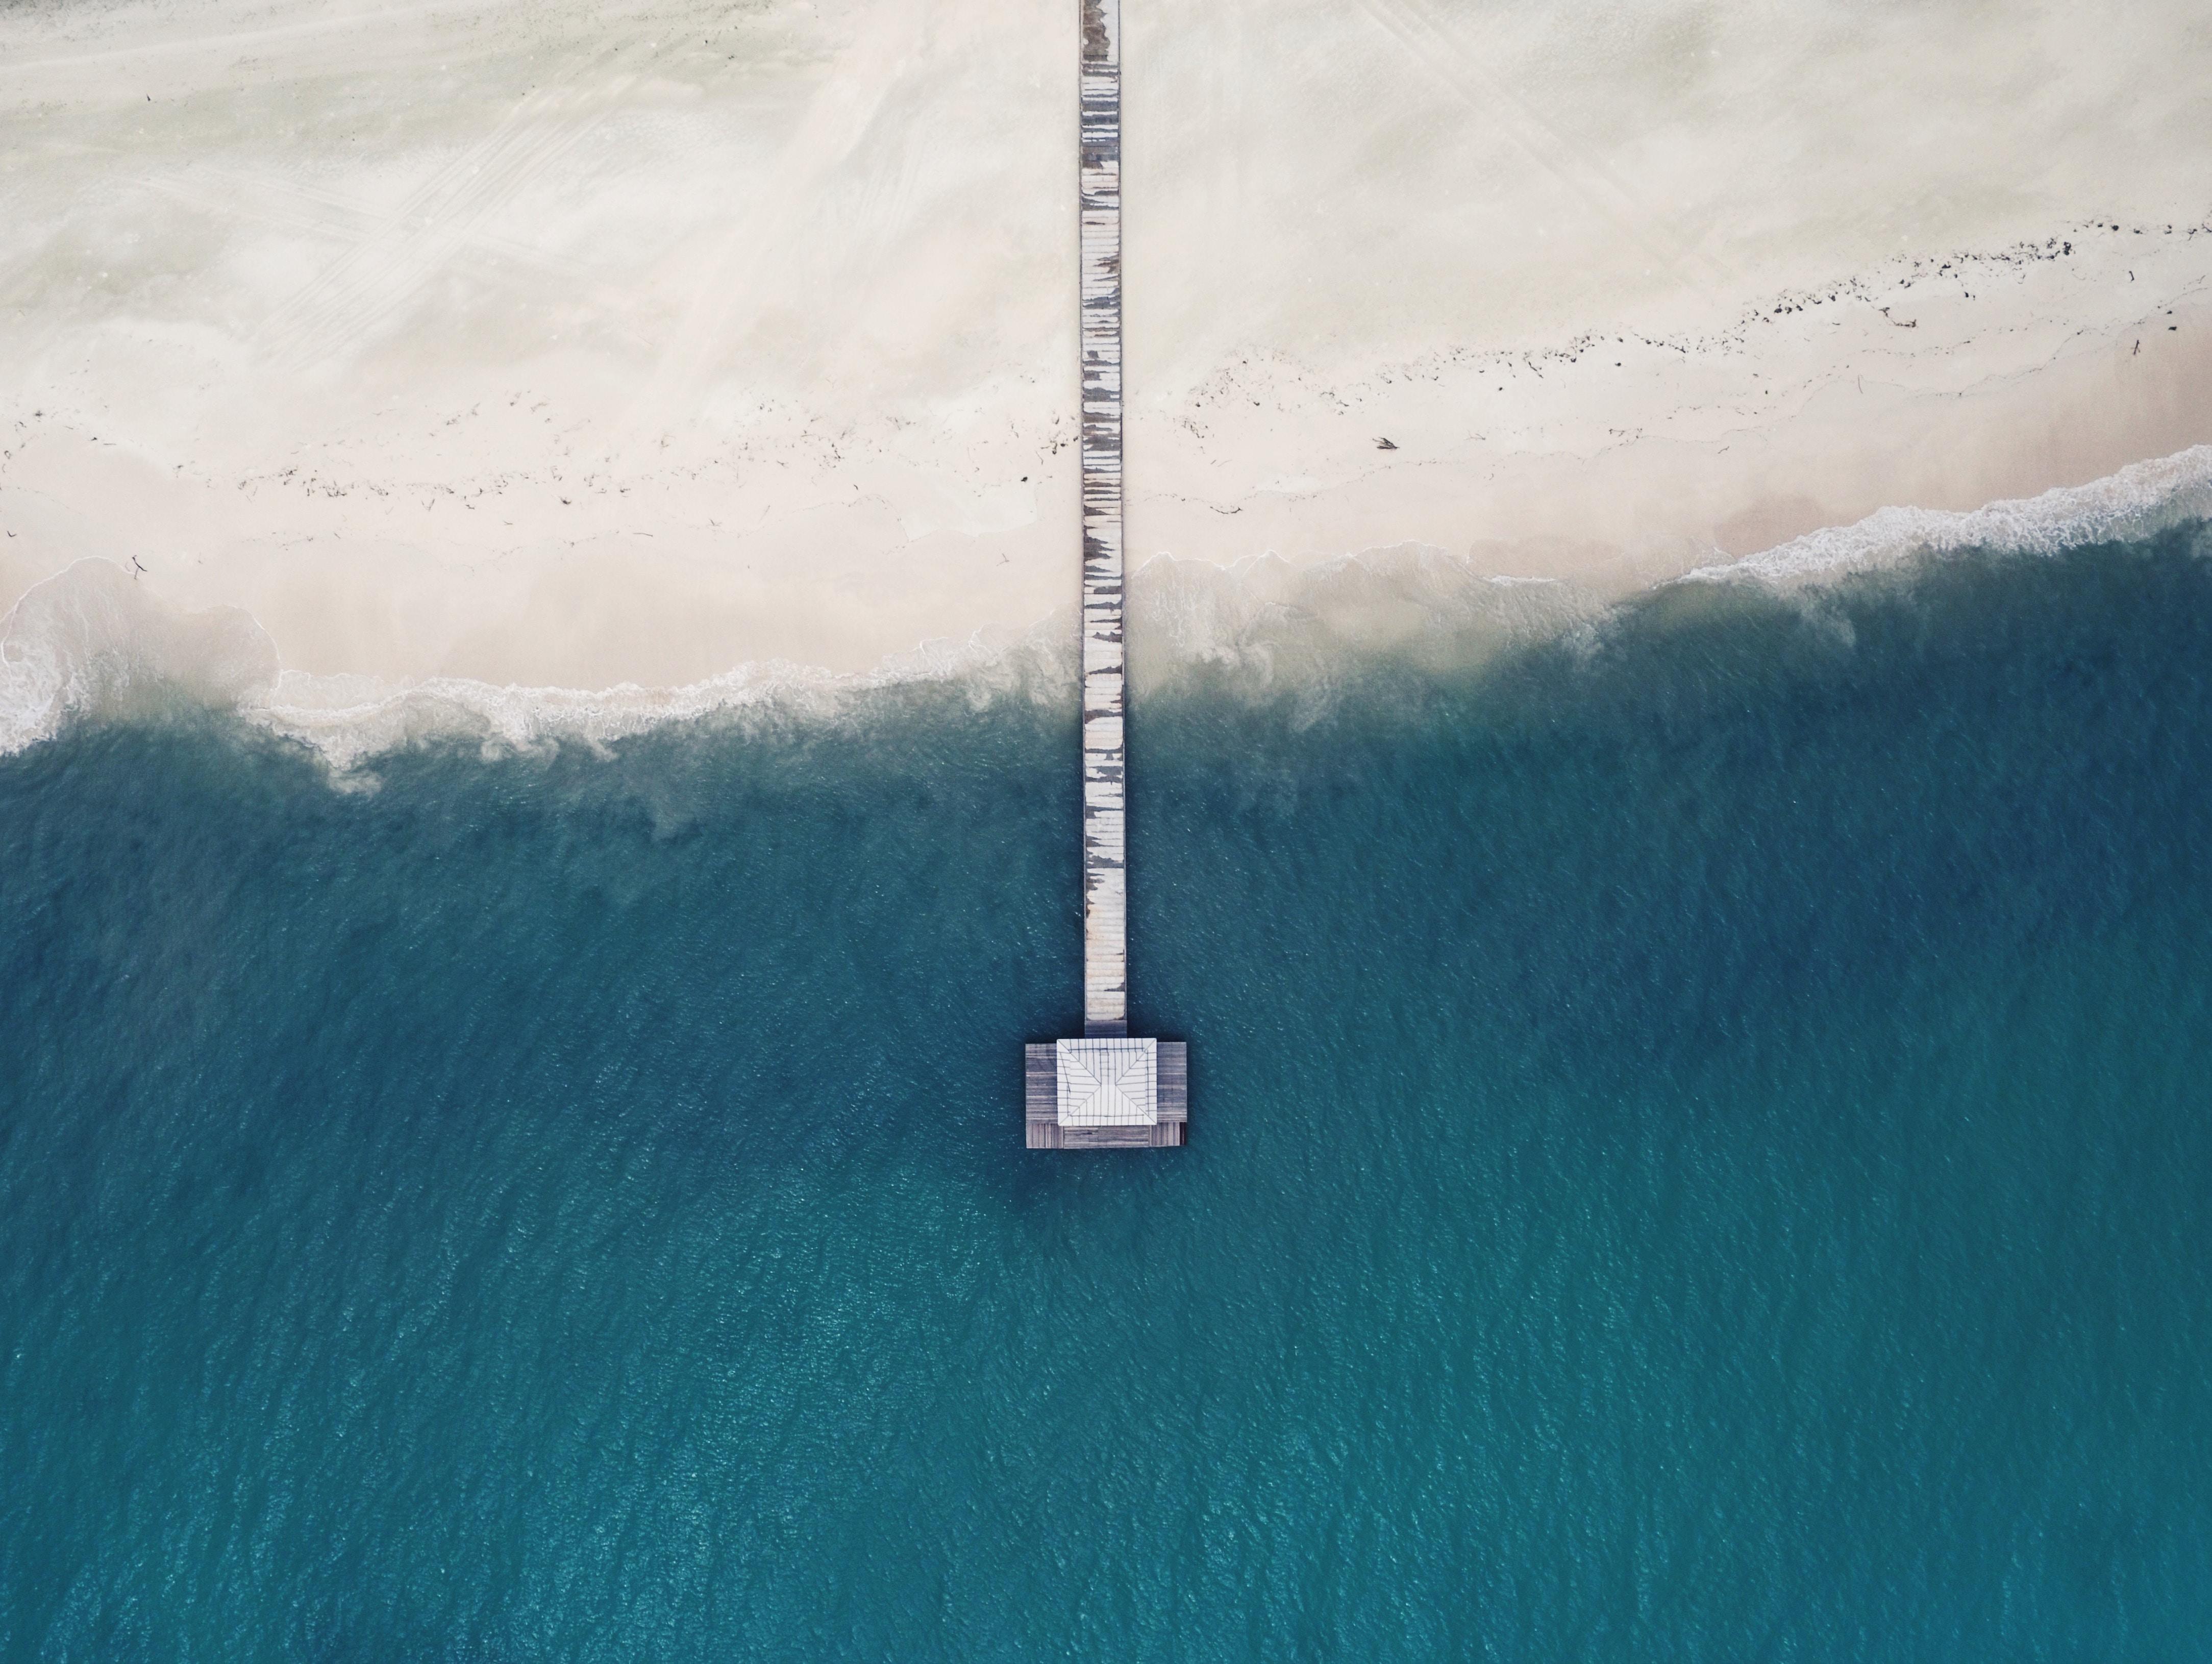 bird's eye view photography of white sand beach